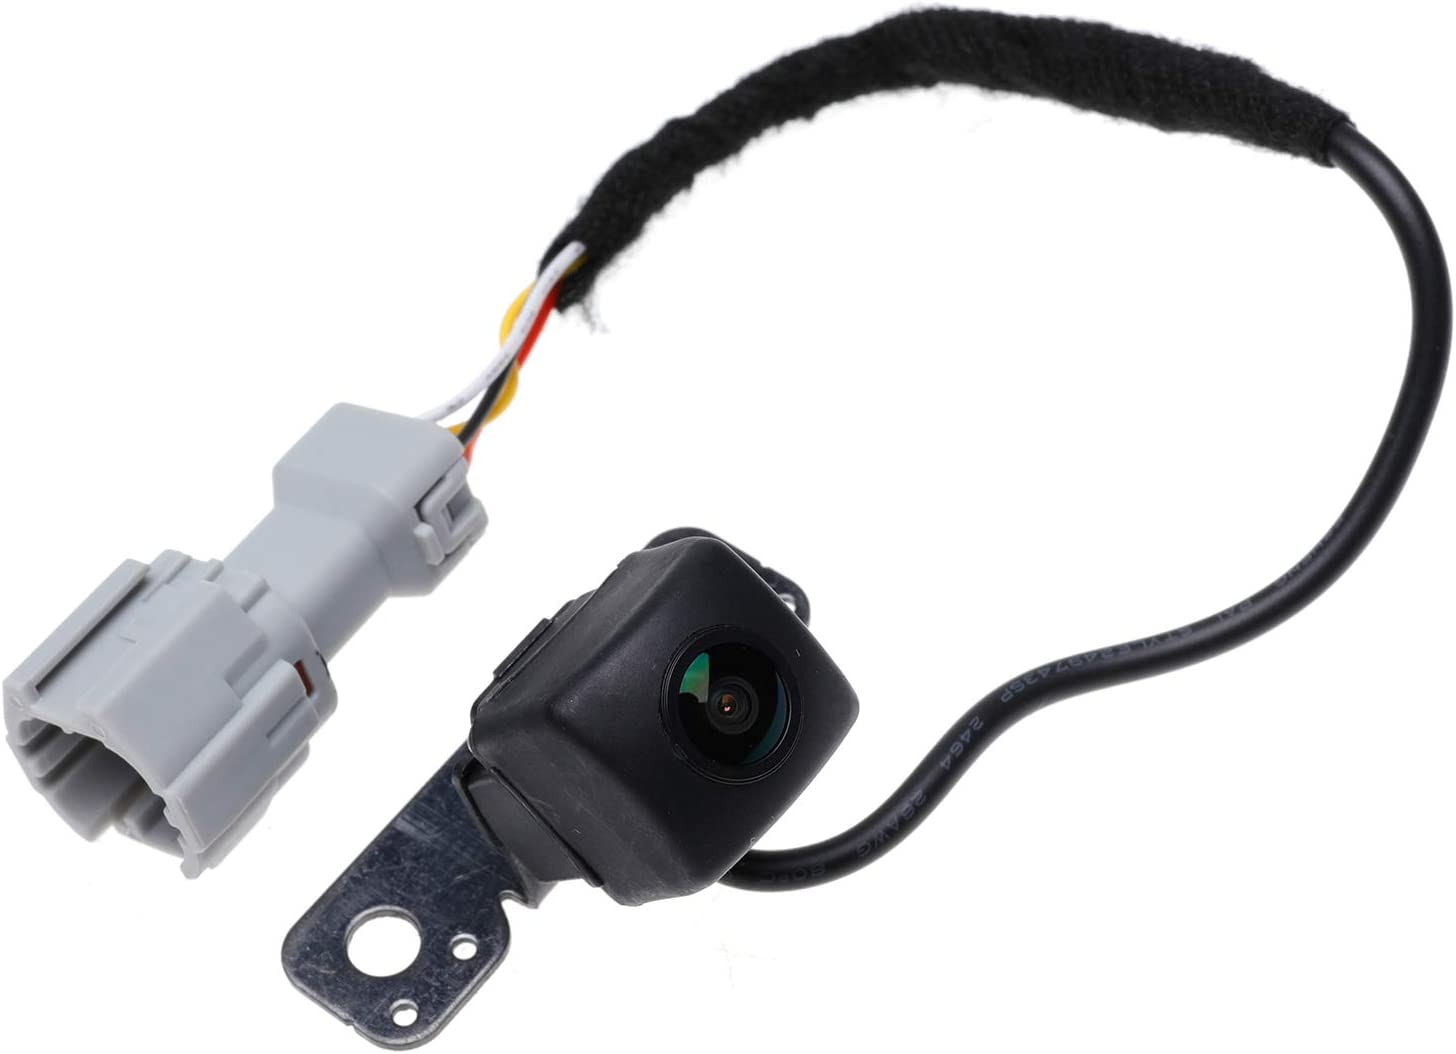 Rear View Backup Parking Assist Camera for Hyundai Santa Fe Sport 2.0 2.4 2013-2016 Replace 95760-2W000 95760-2W000-FFF 95760-2W300